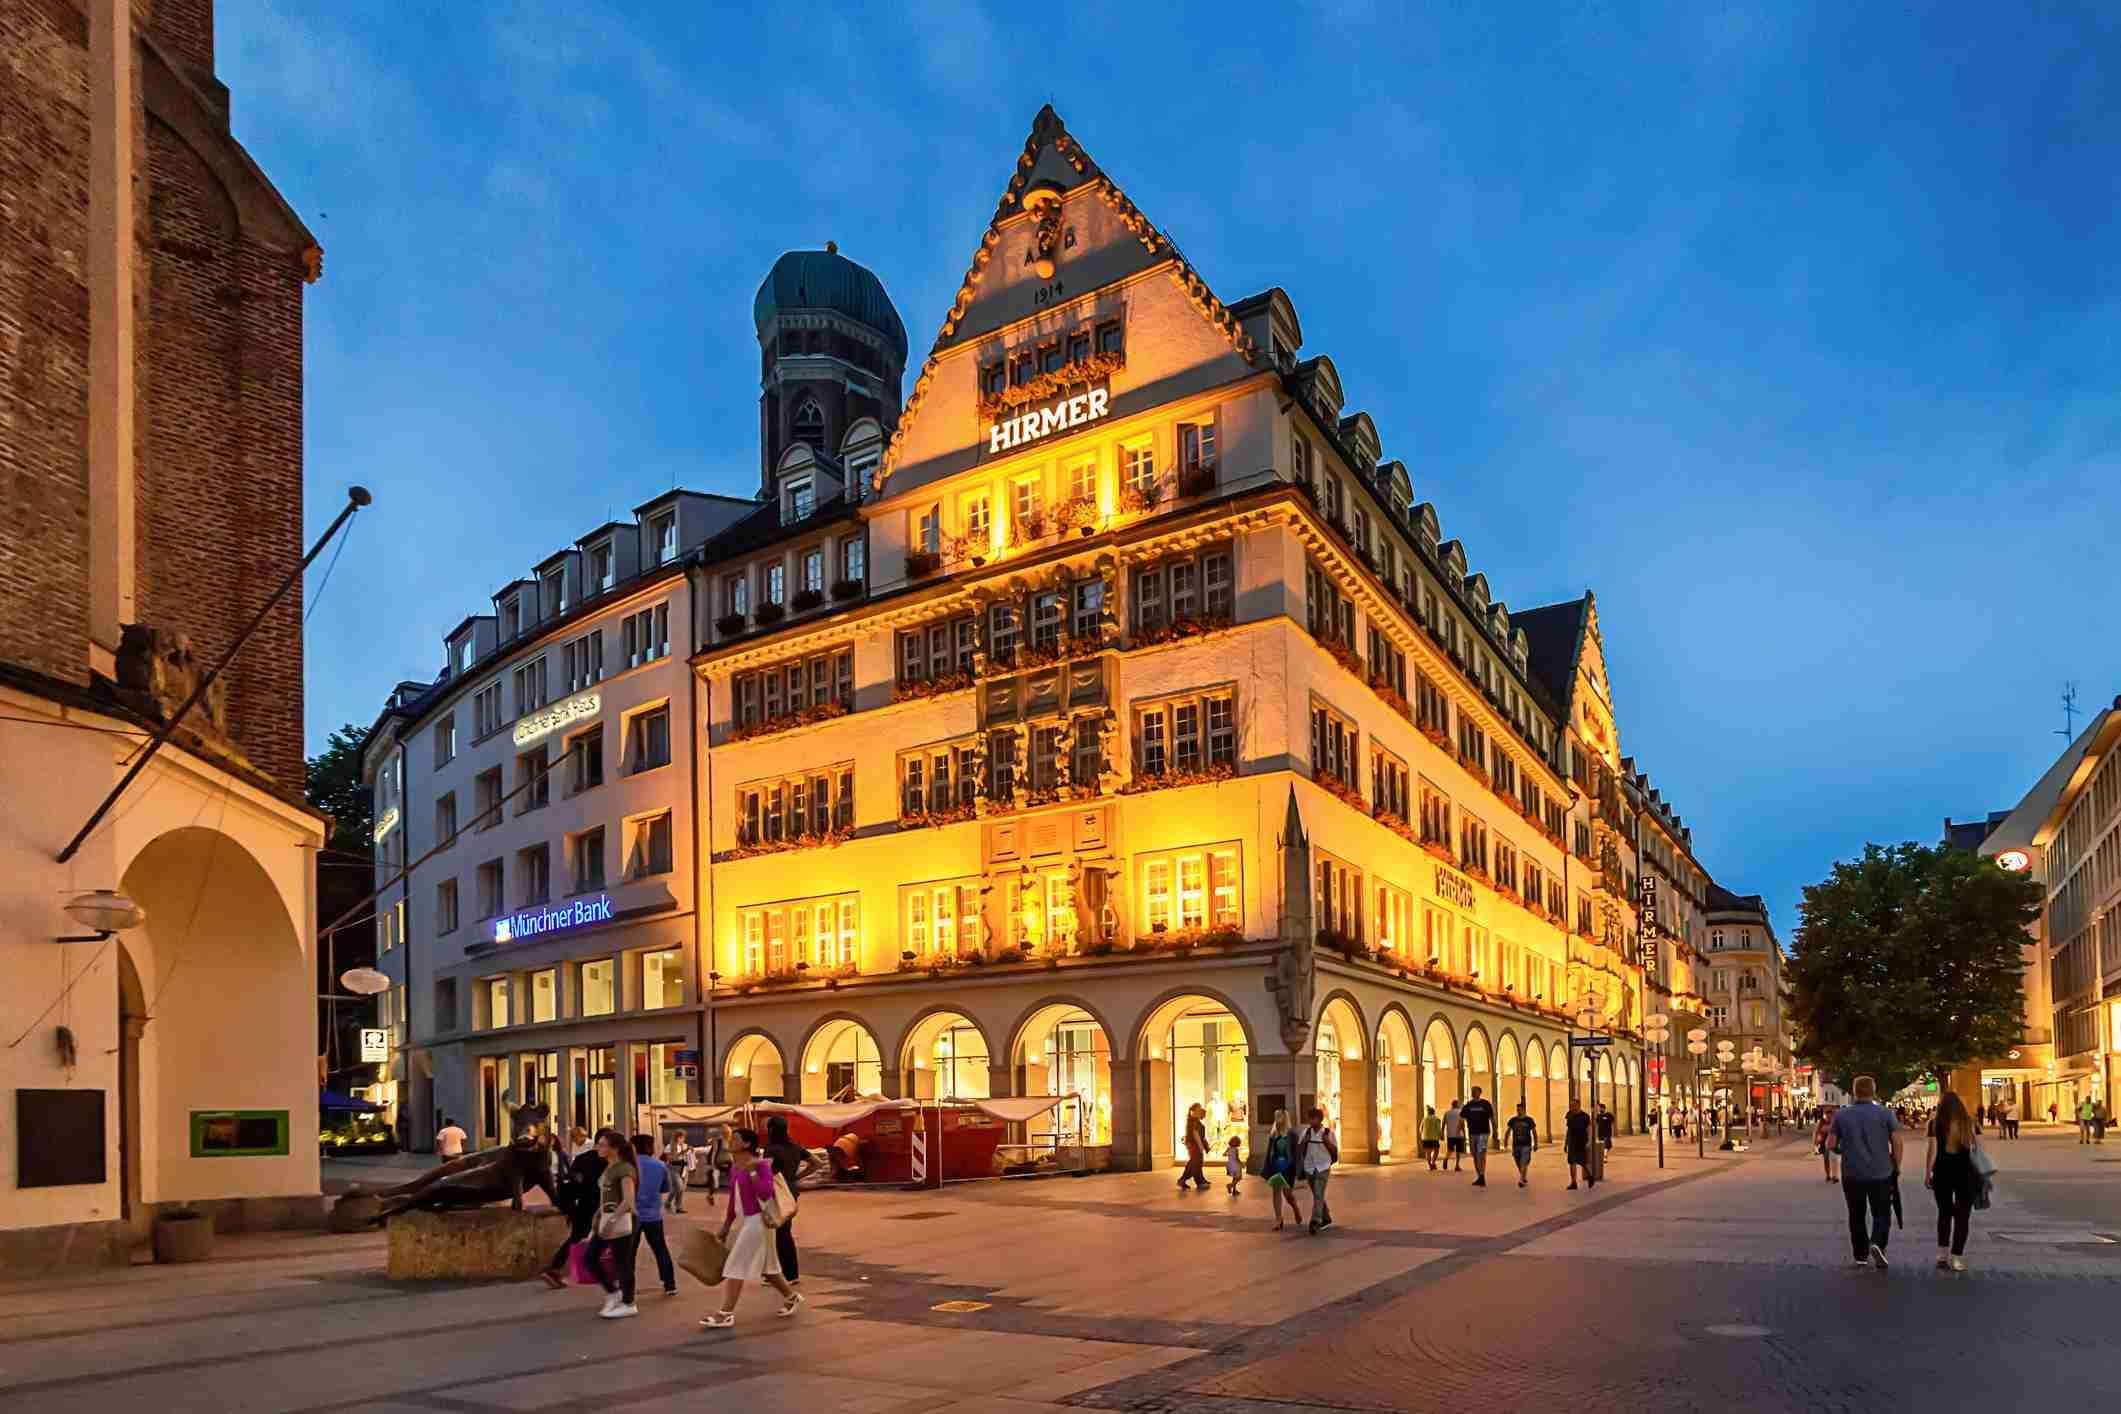 Munich department store